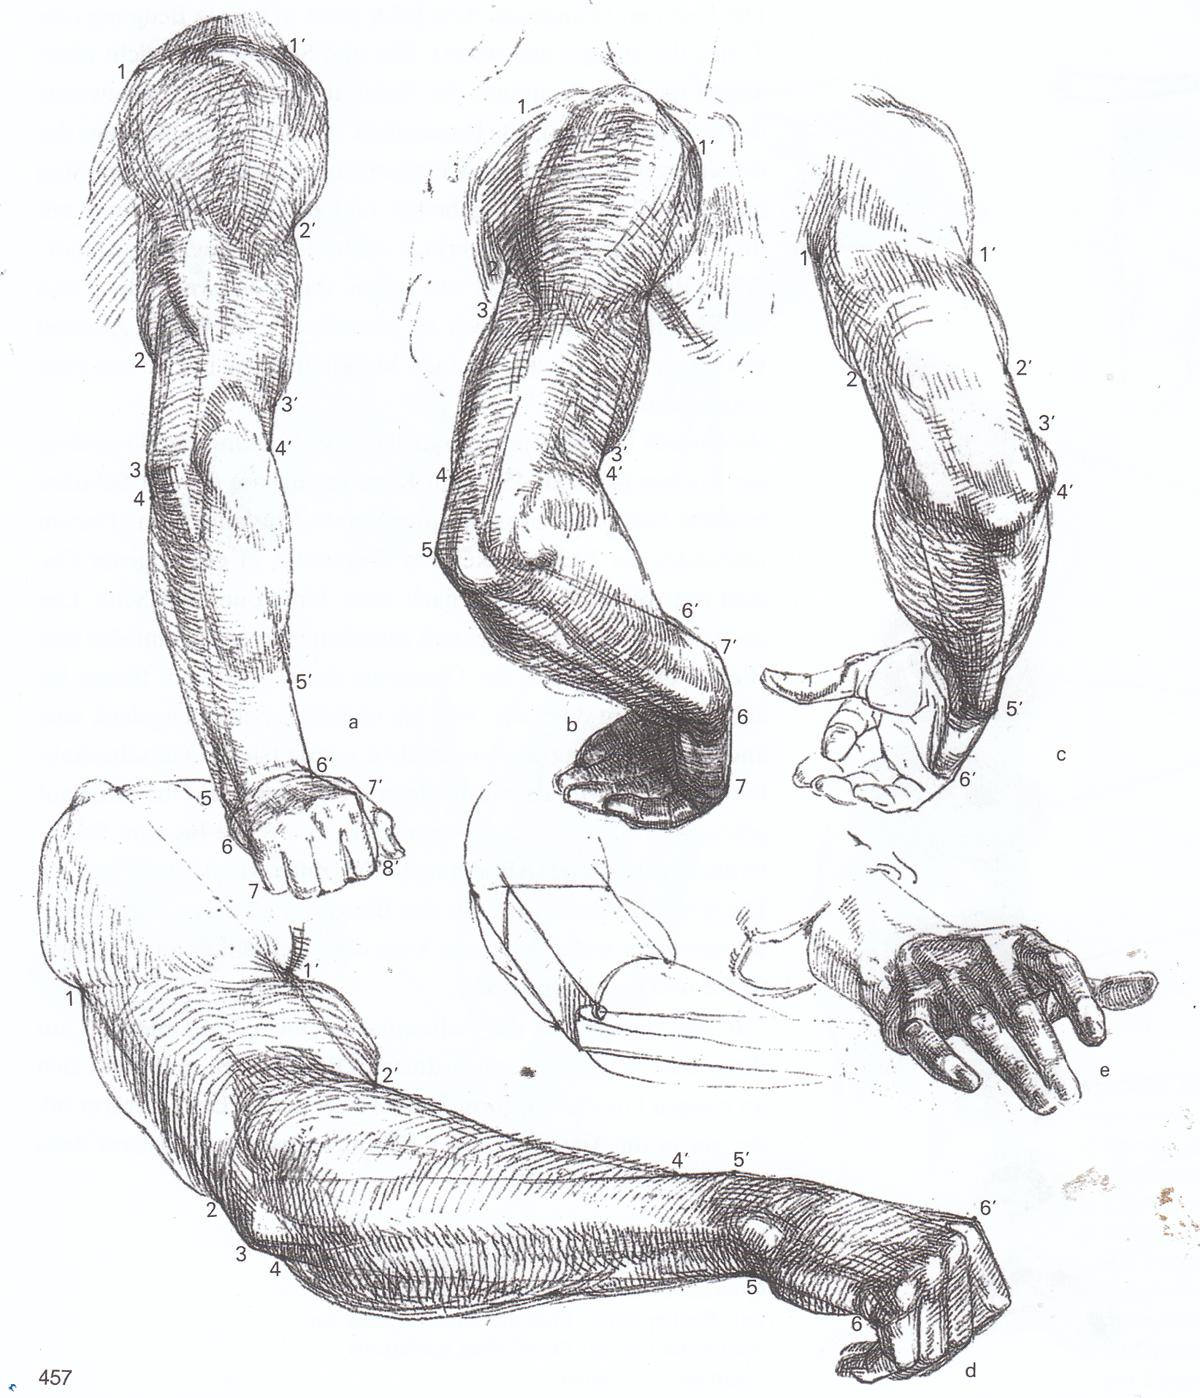 Ziemlich Oberlid Anatomie Fotos - Anatomie Ideen - finotti.info